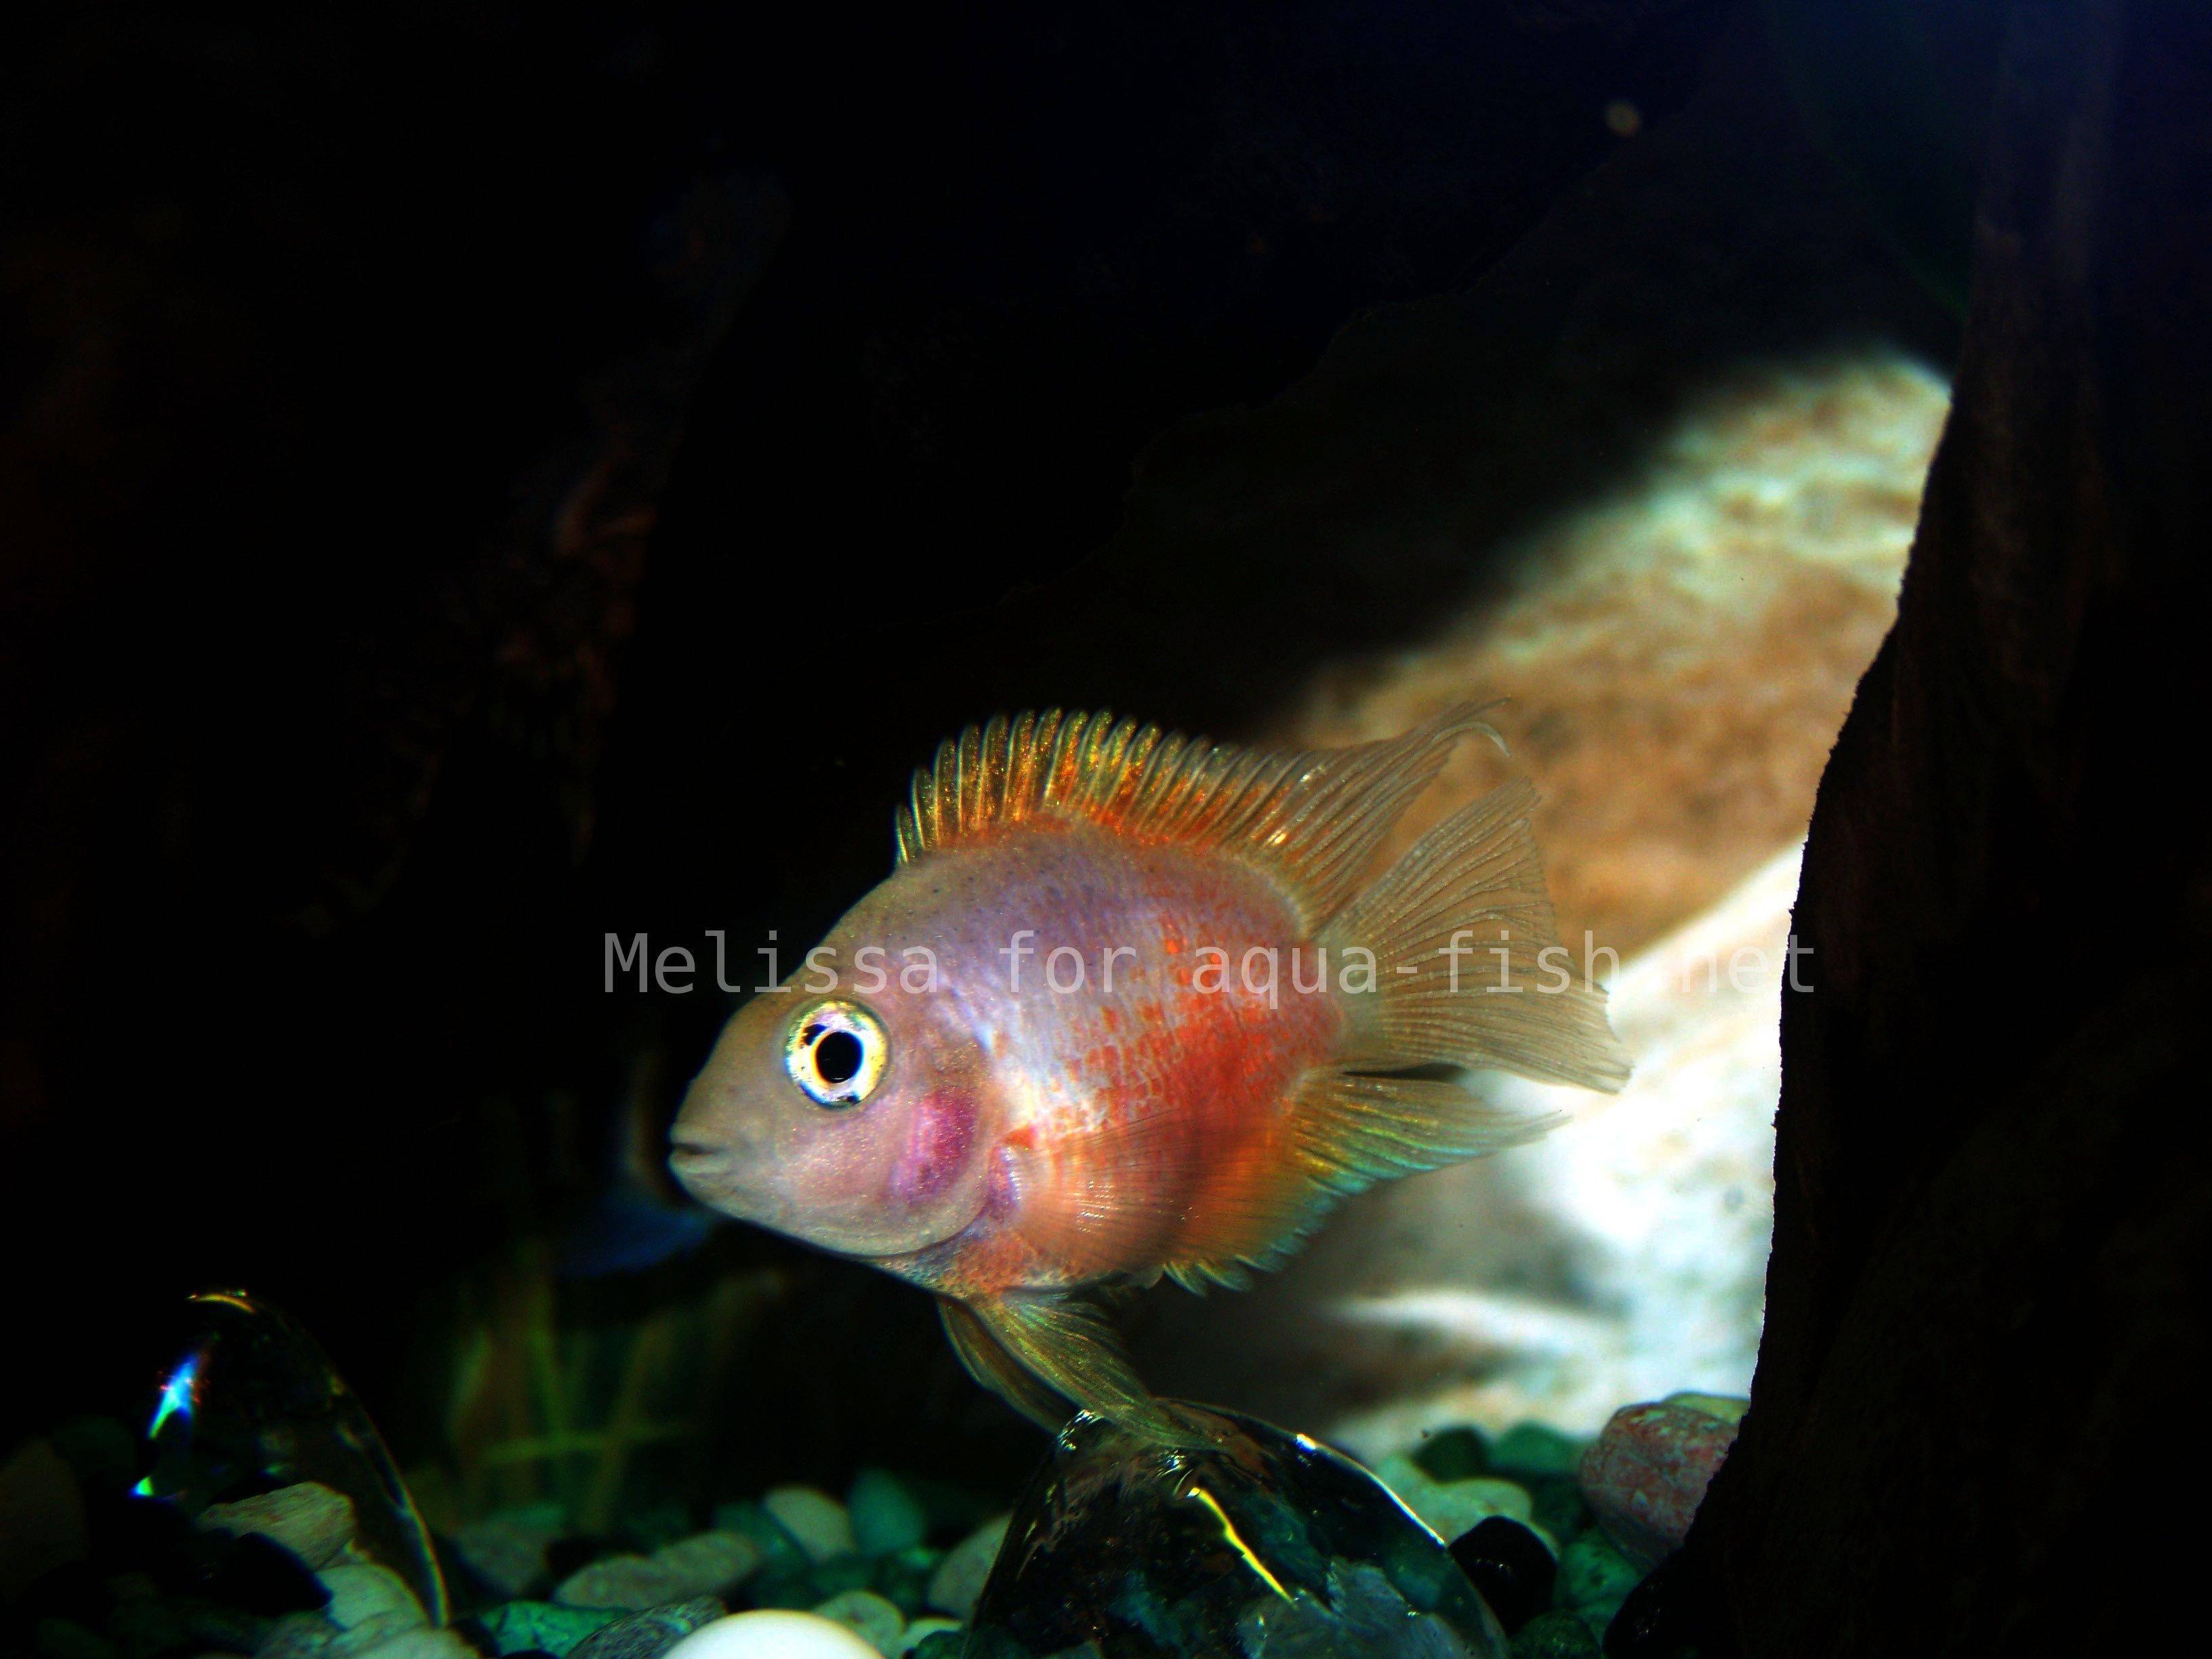 Bubblegum Parrot Fish Images & Pictures - Becuo